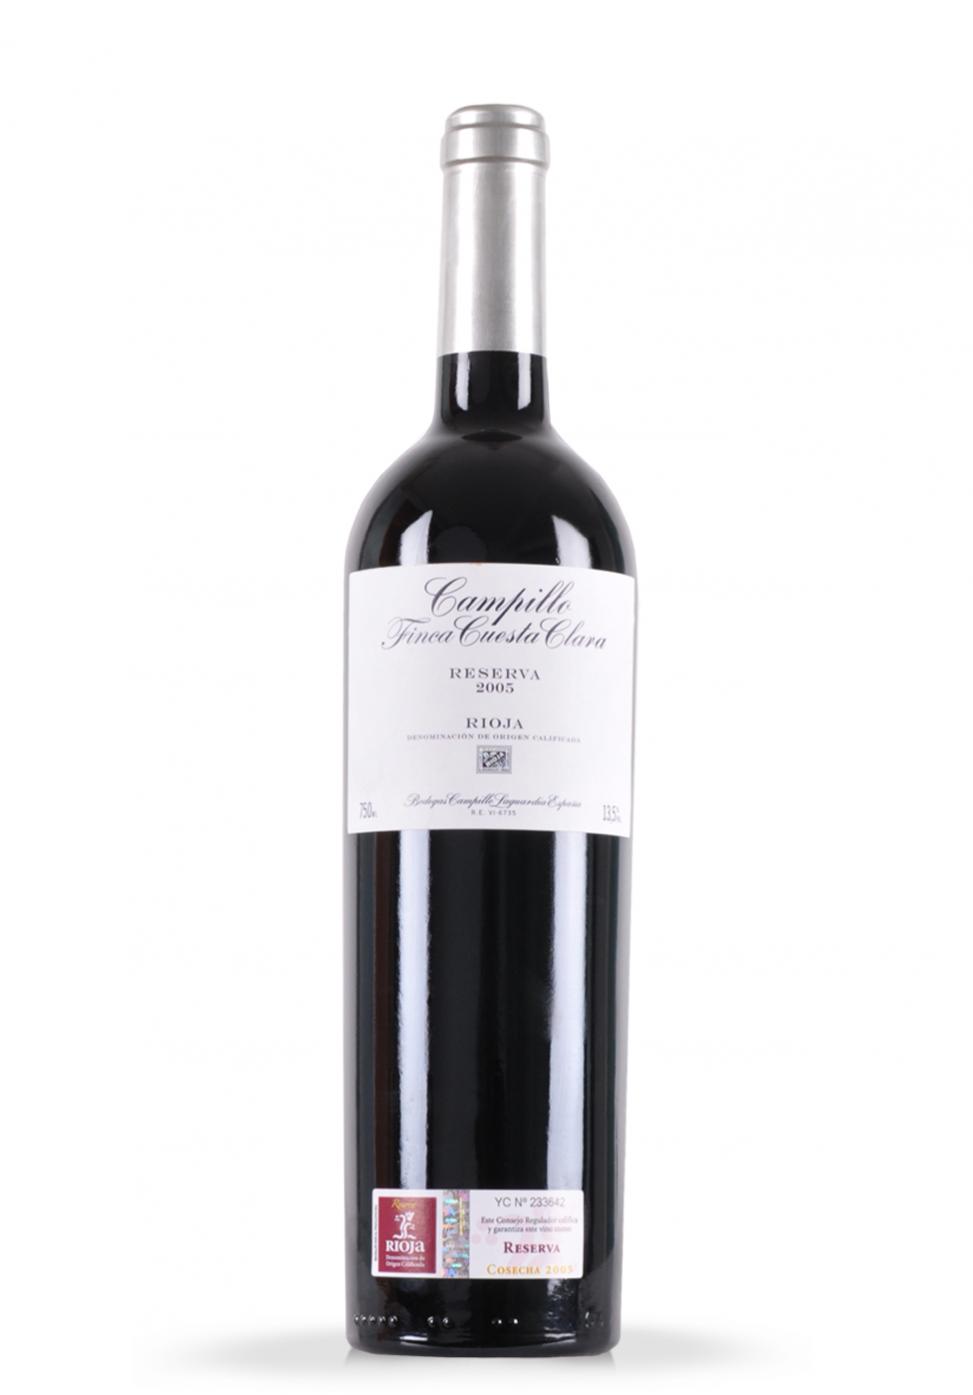 Vin Campillo Finca Cuesta Clara, DOCa Rioja, Reserva 2005 (0.75L)